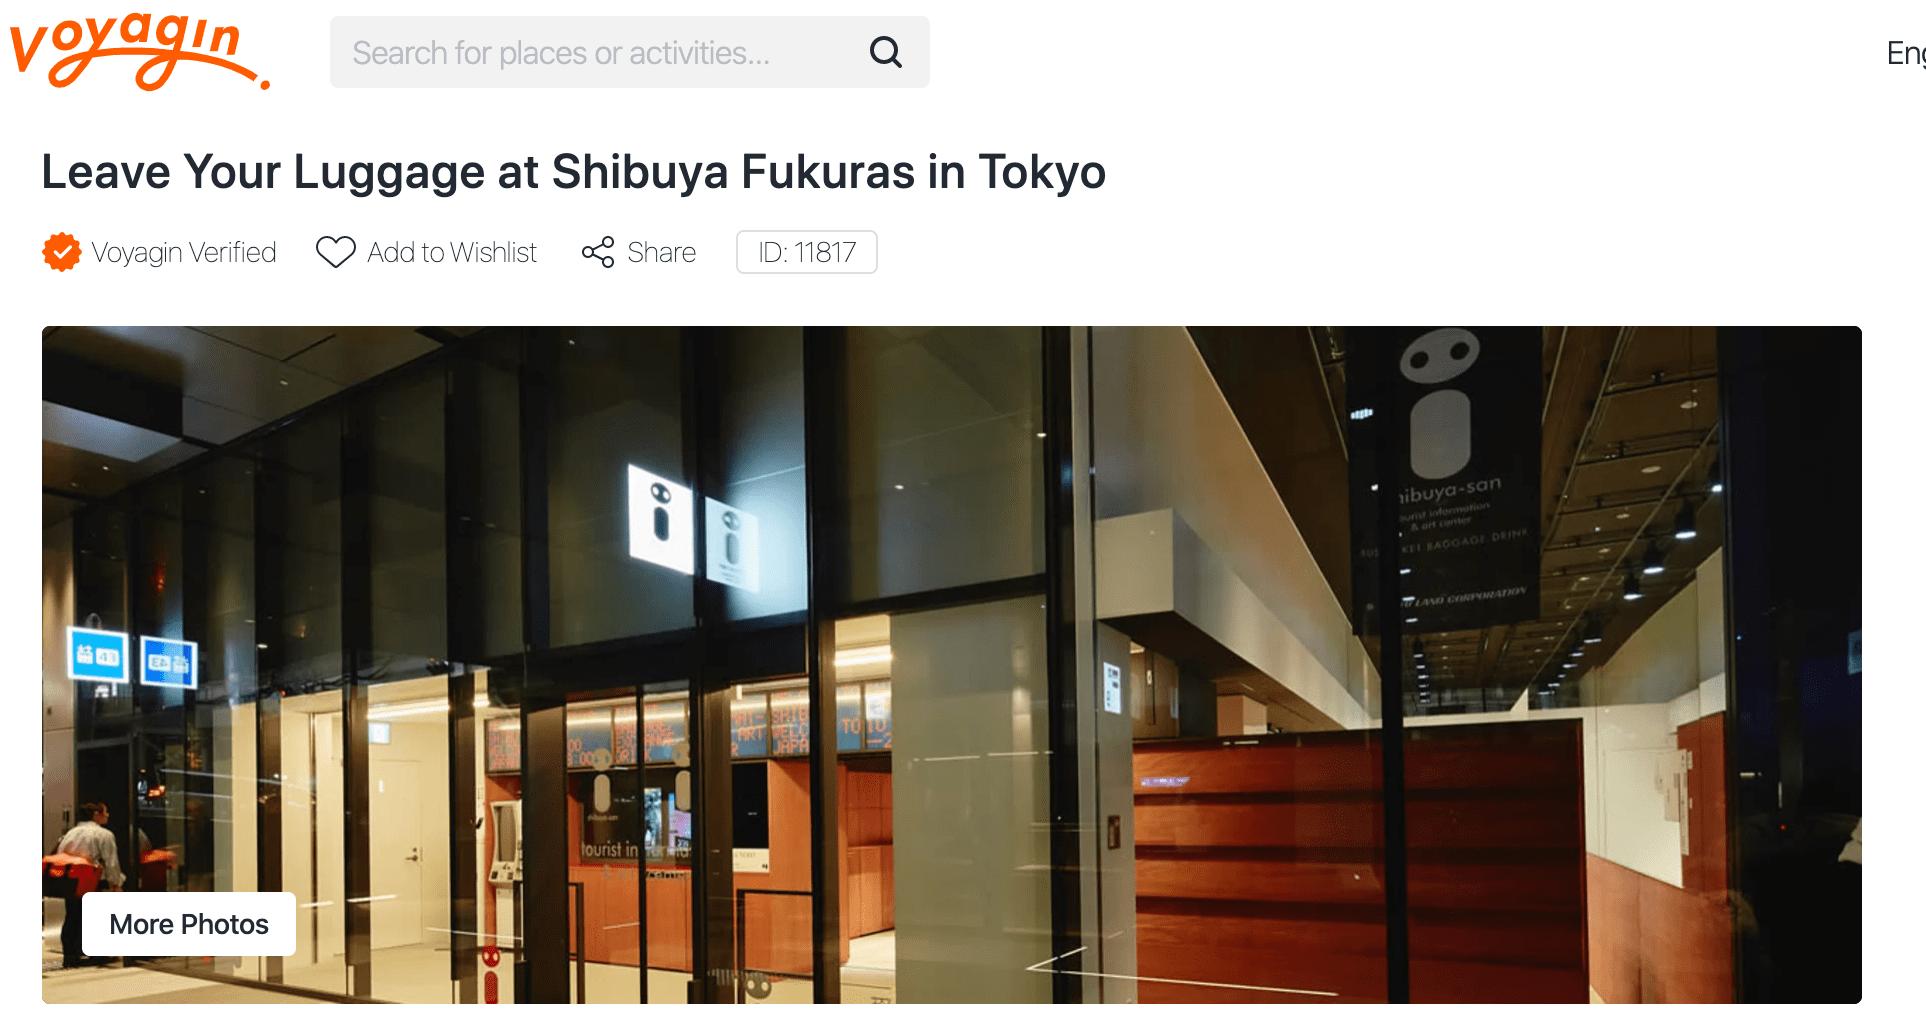 Storage room in Shibuya Fukuras